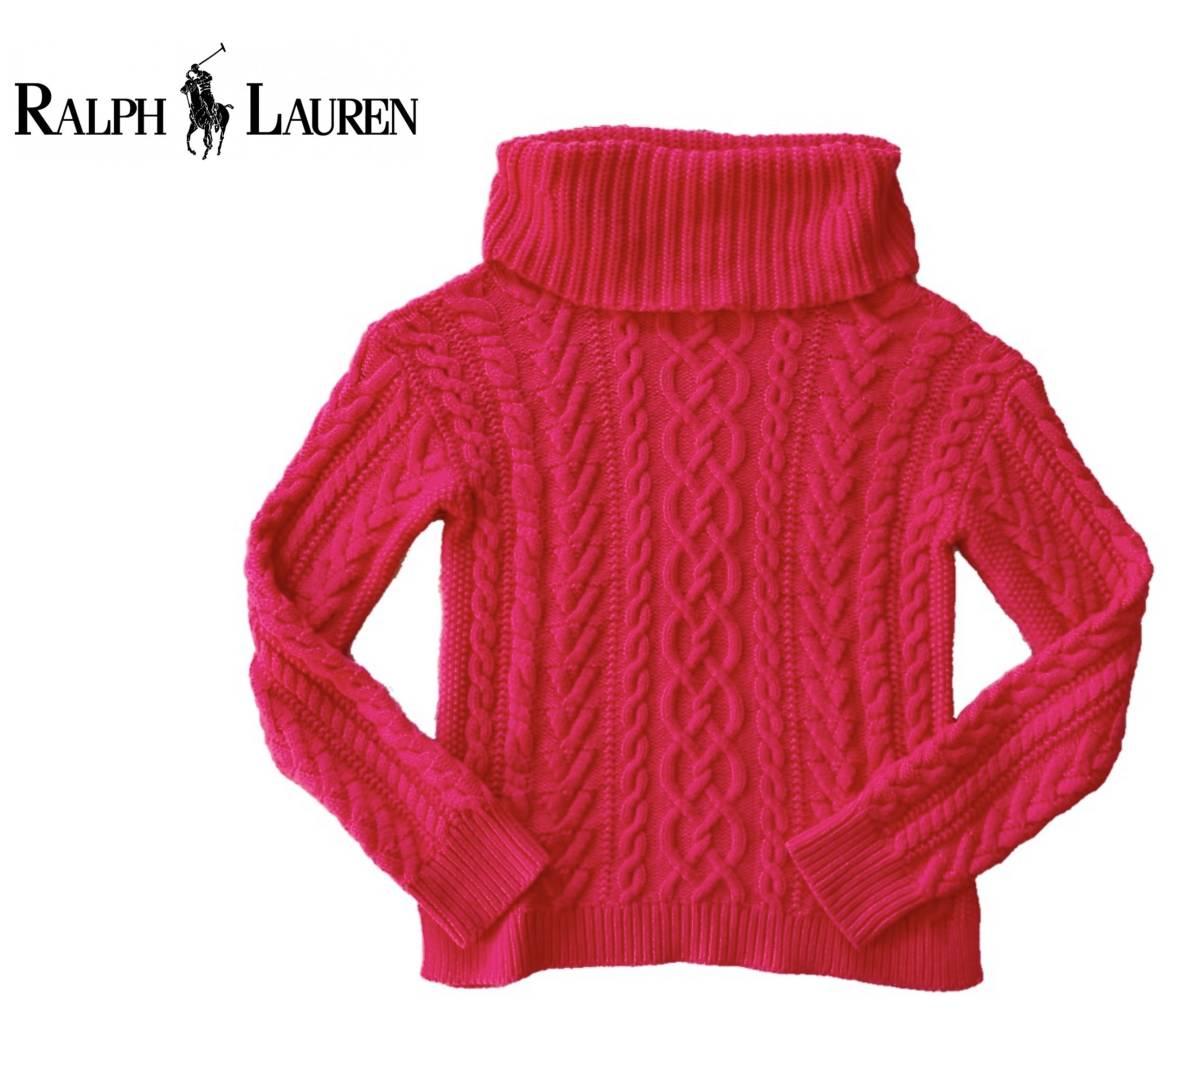 ★RALPH LAUREN ラルフローレン タートルネック コットン ケーブル ニット セーター ピンク XL_画像2